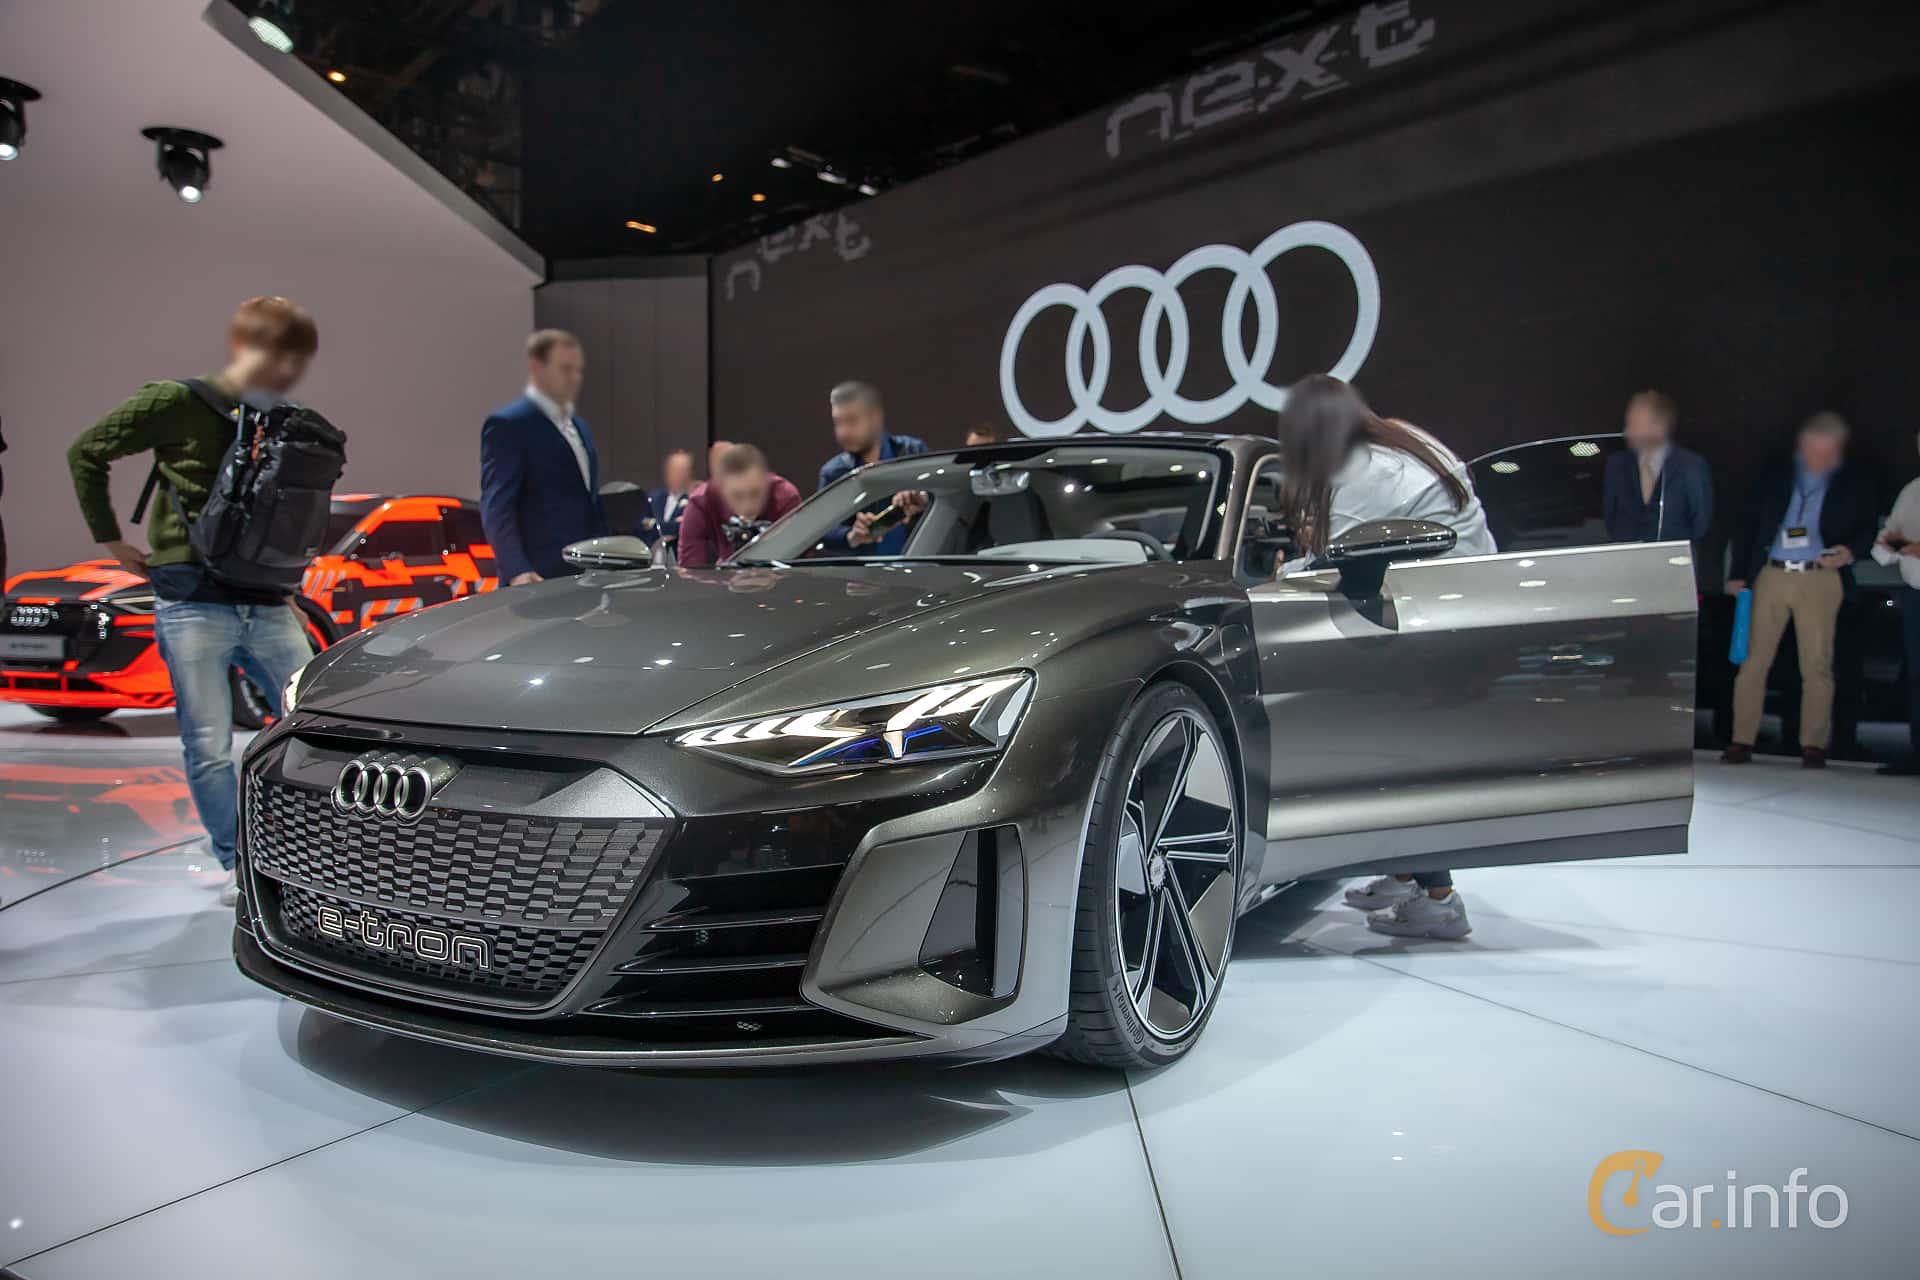 Audi e-tron GT 90 kWh quattro Single Speed, 590hp, 2019 at Geneva Motor Show 2019